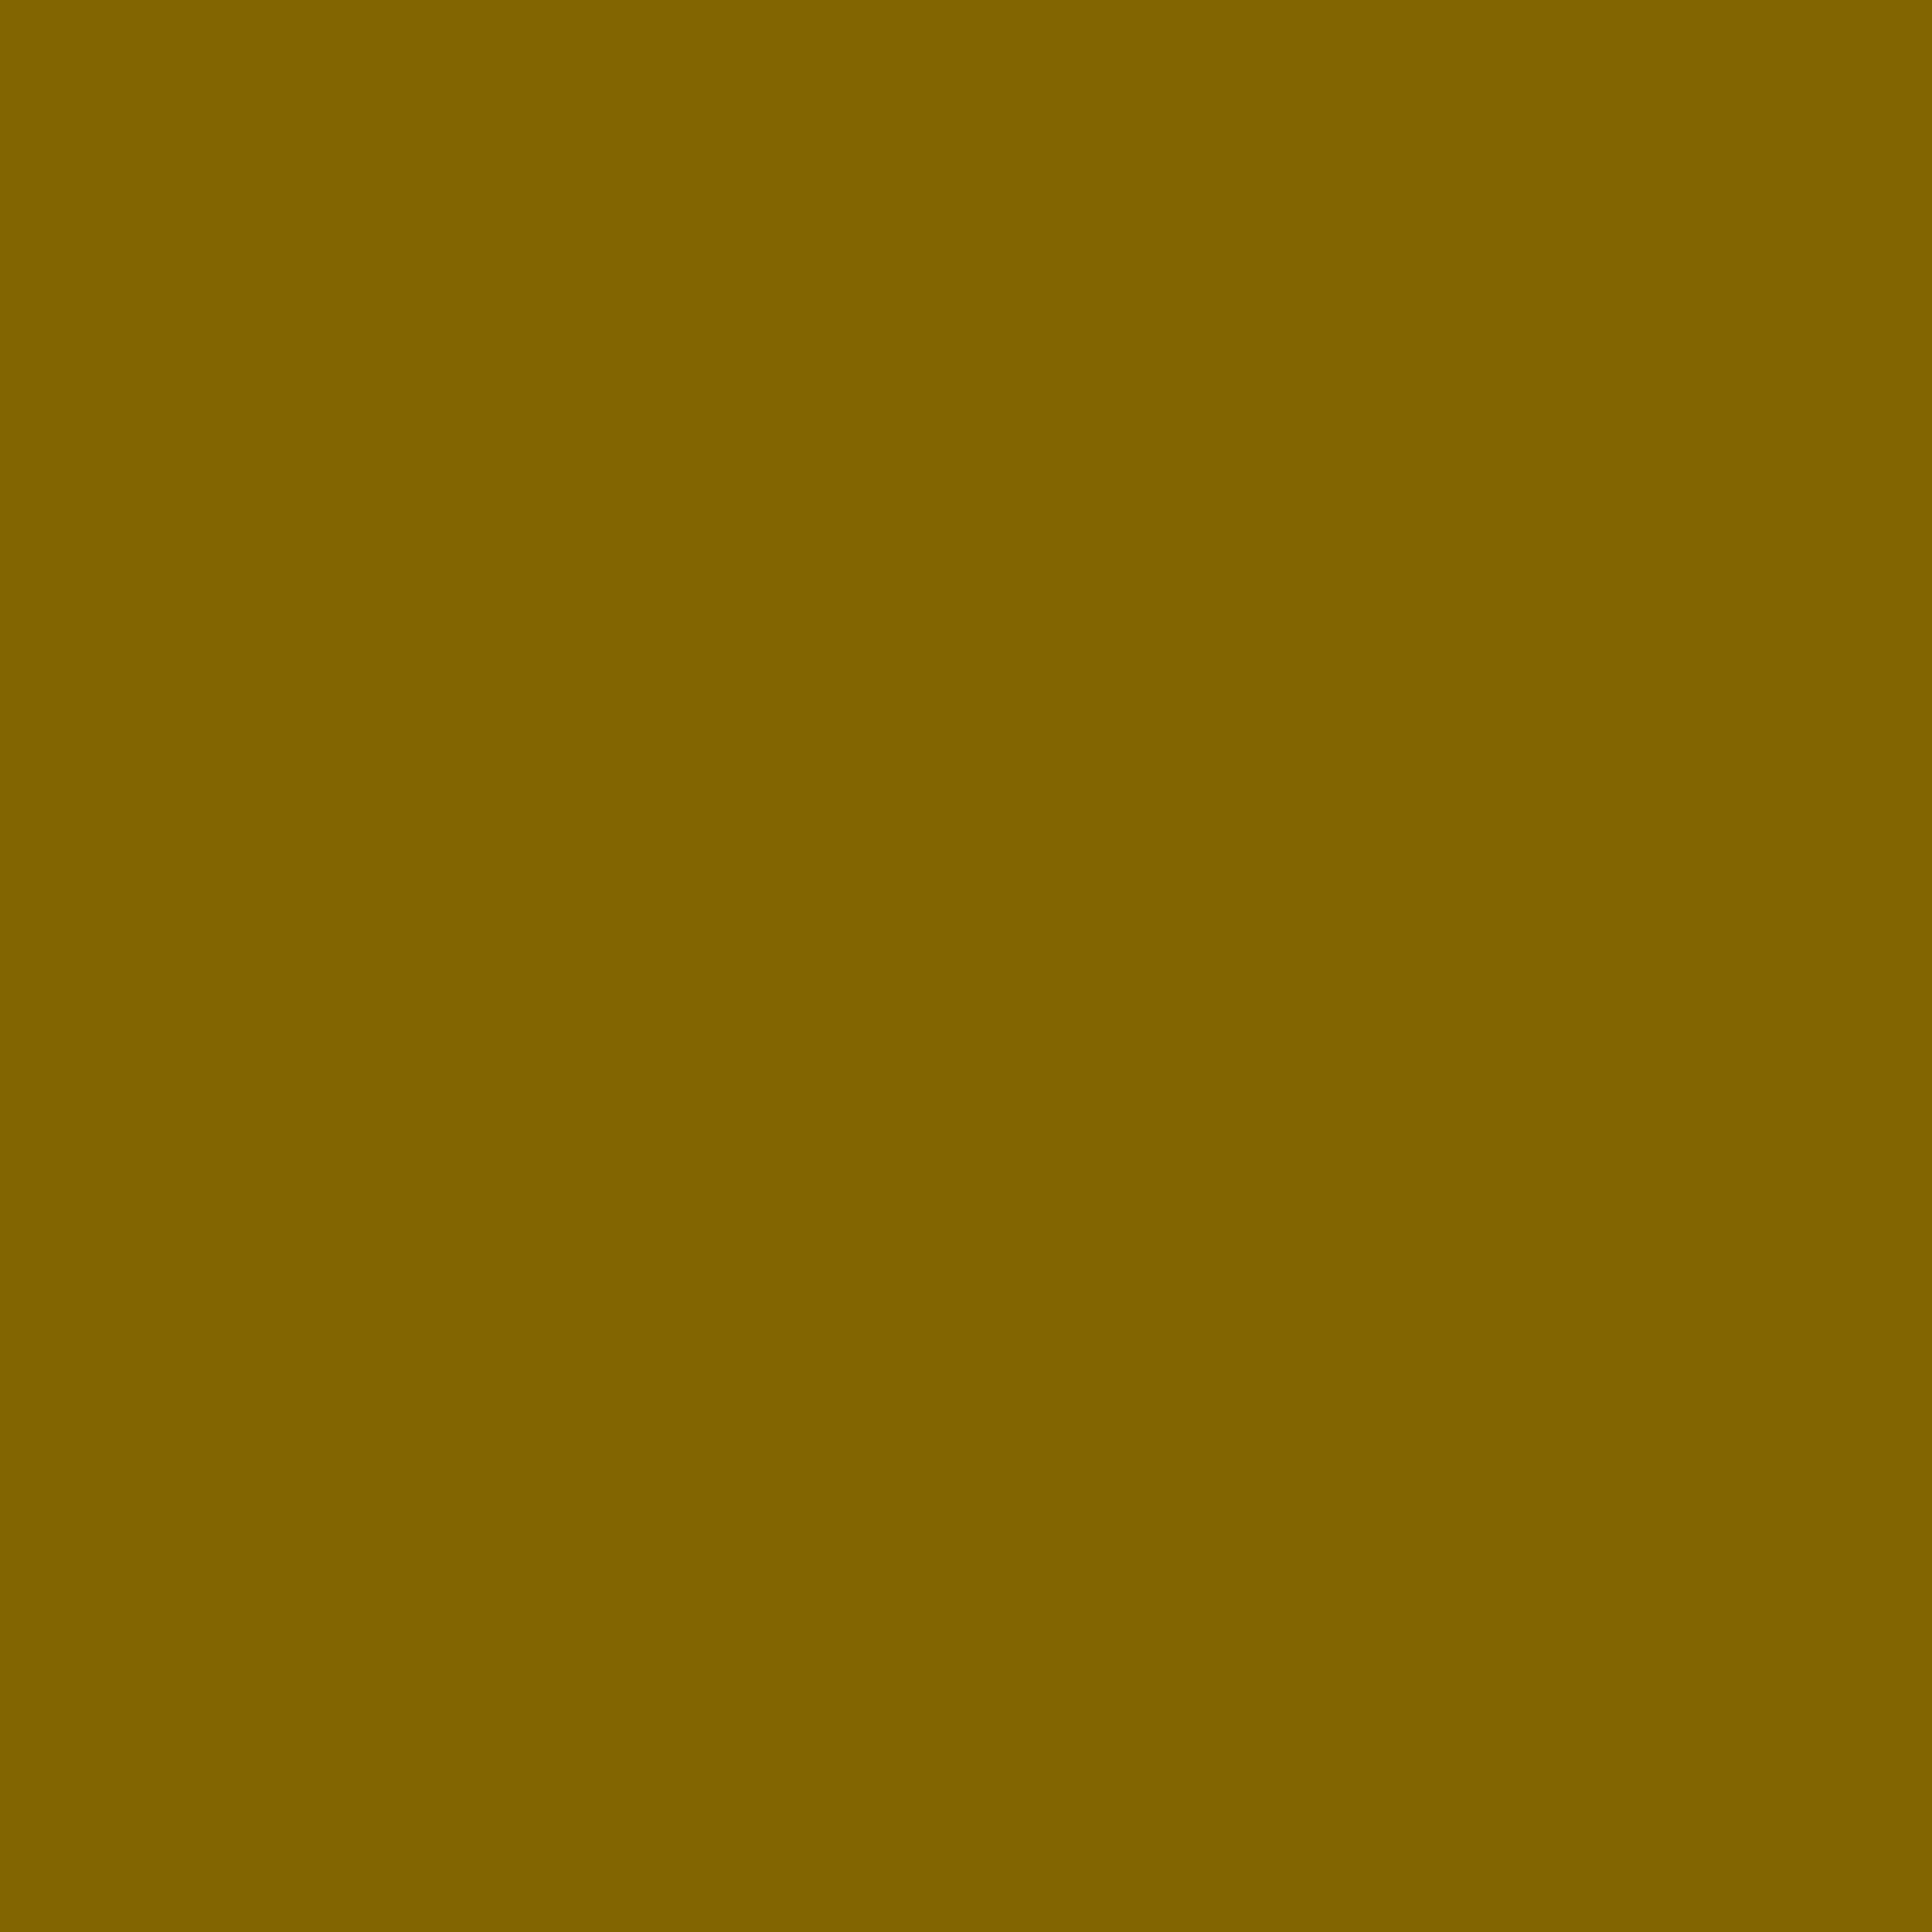 Rosco E-Colour+ #741 Mustard Yellow 102307412124 B&H Photo ...